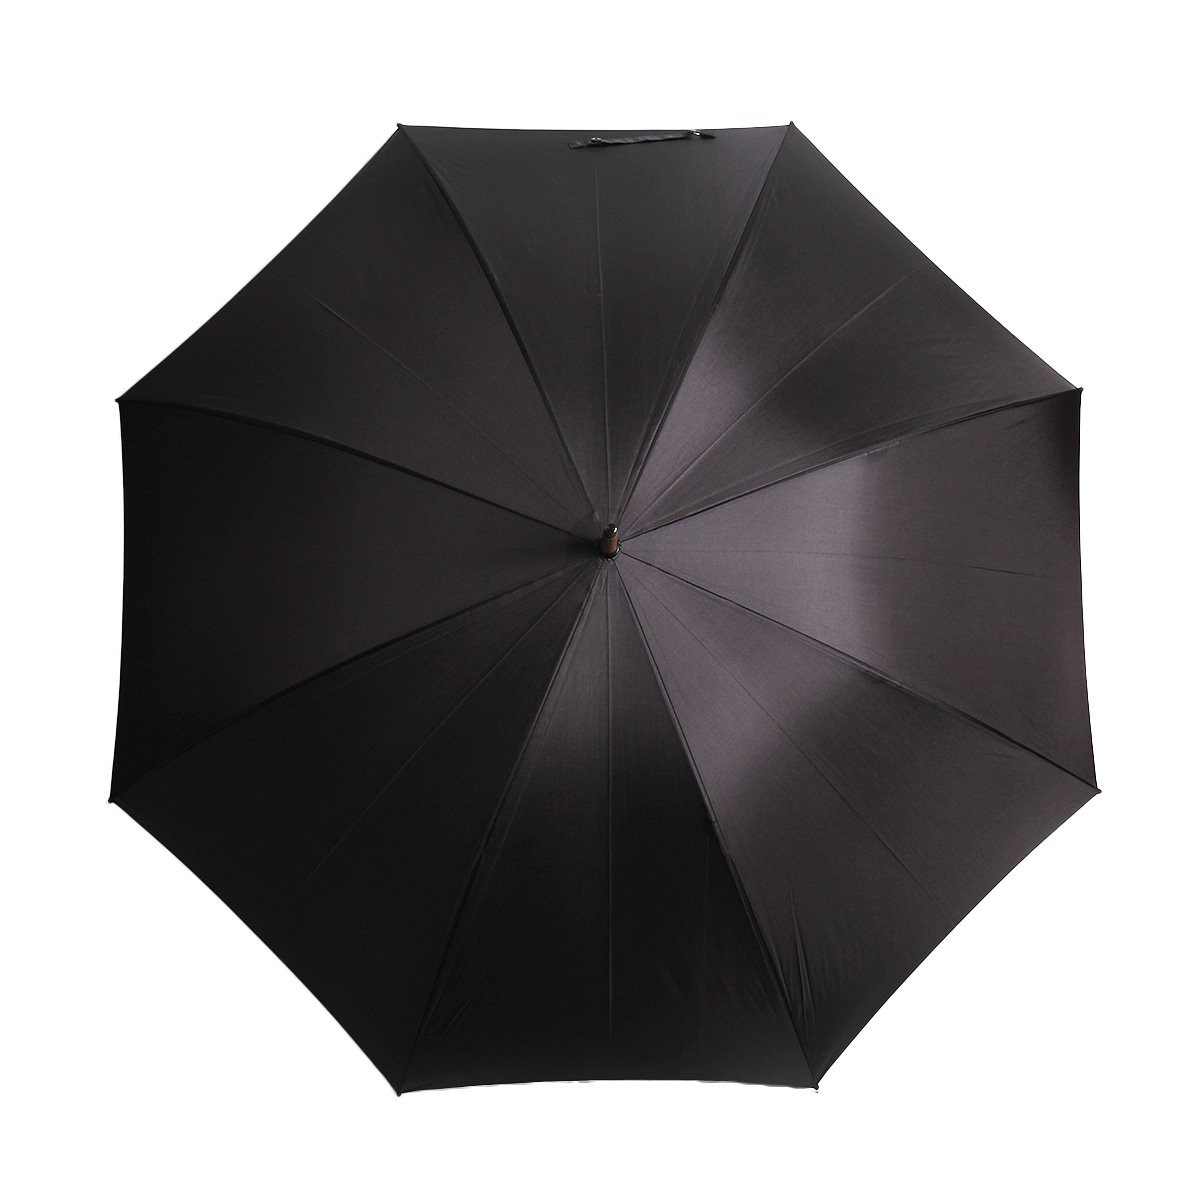 【10%OFF】【公式限定】富士絹 細巻き 長傘(アイアンウッド) 詳細画像6